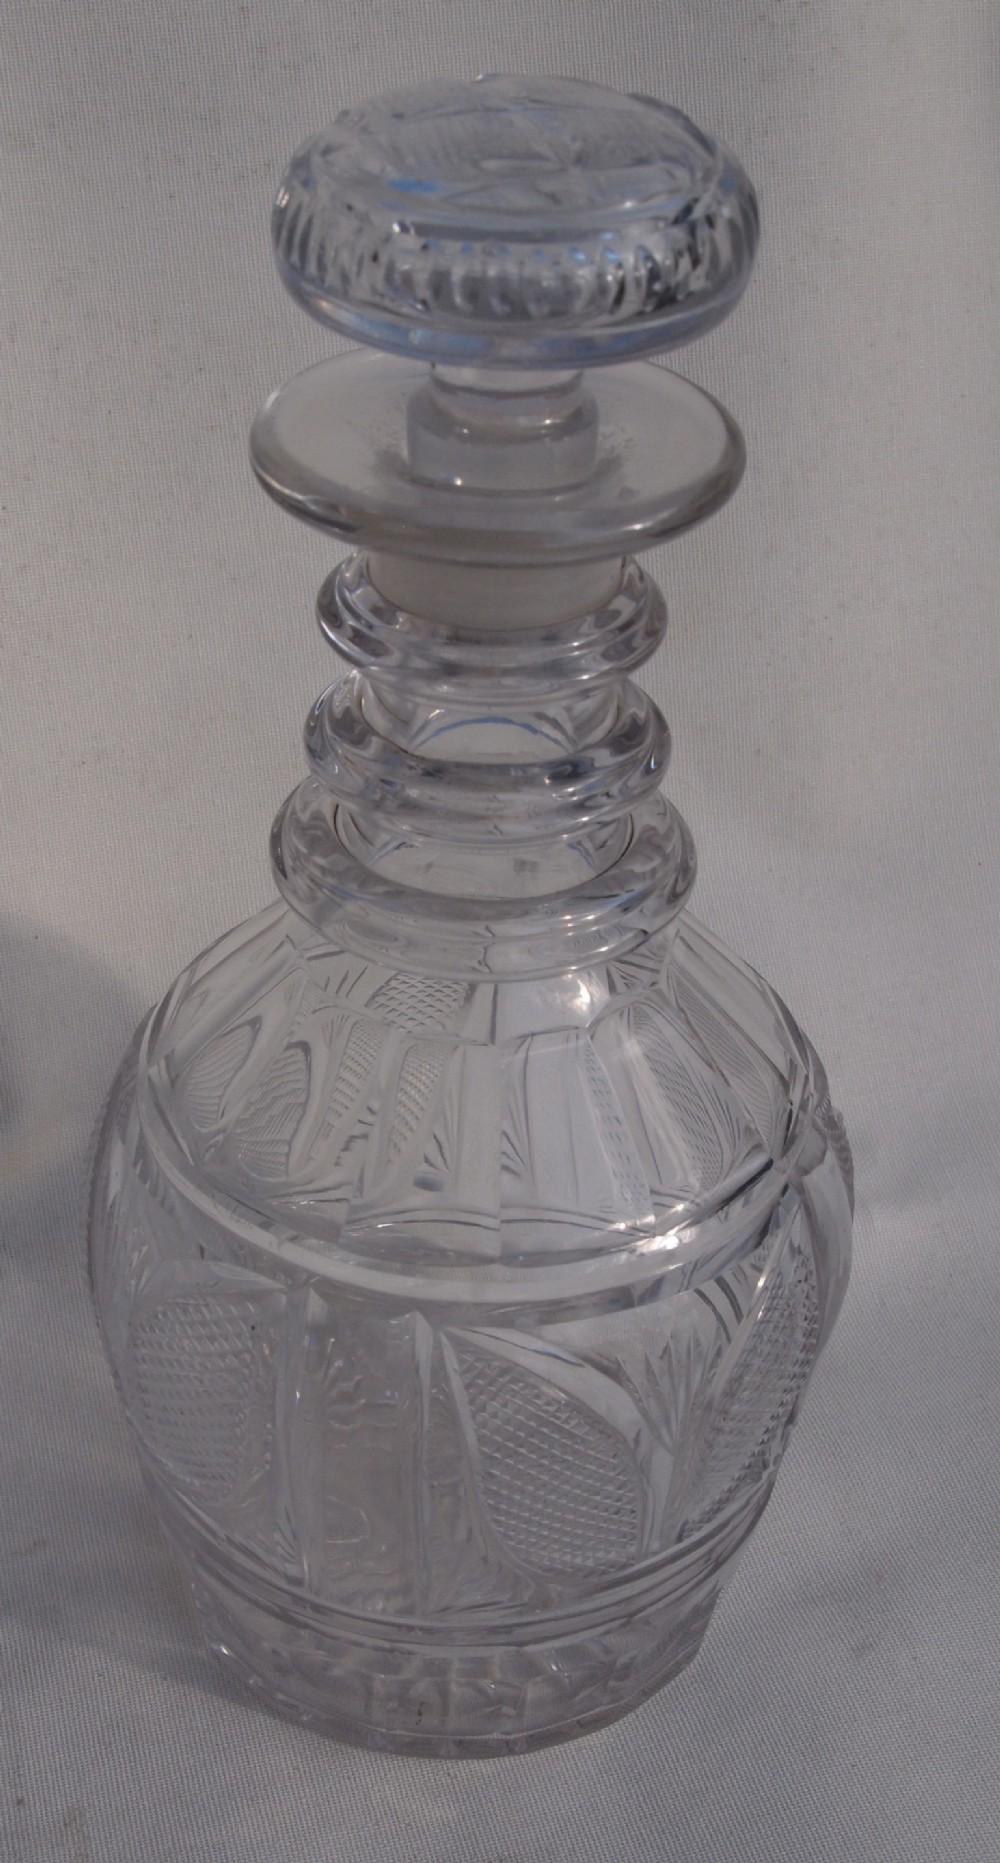 a 19th c spirit decanter